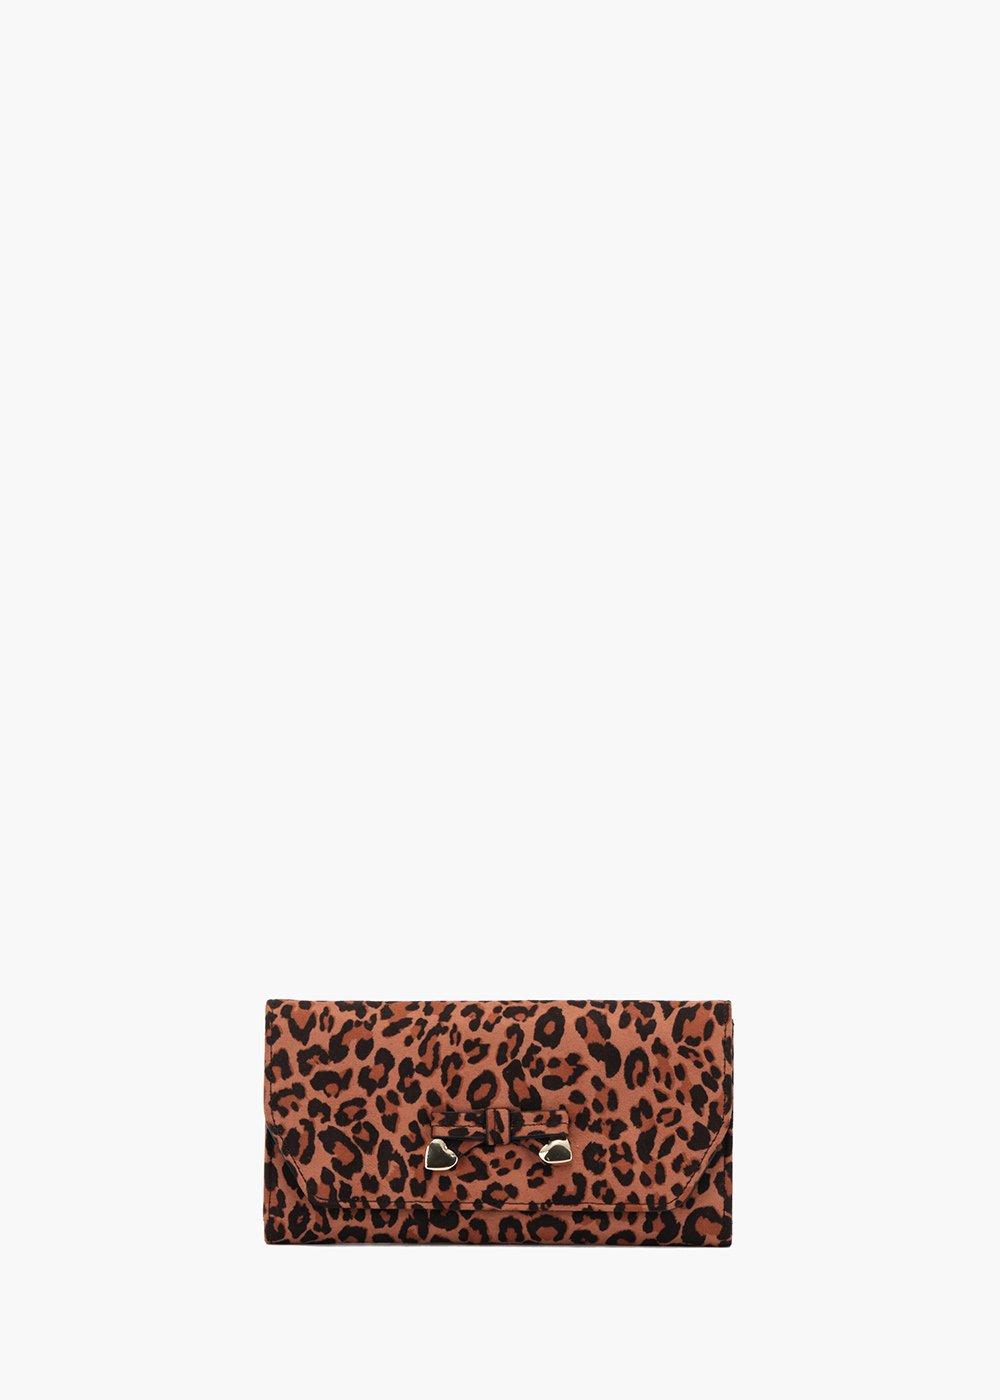 Phoenix wallet with animalier print - Sughero /  Marrone / Animalier - Woman